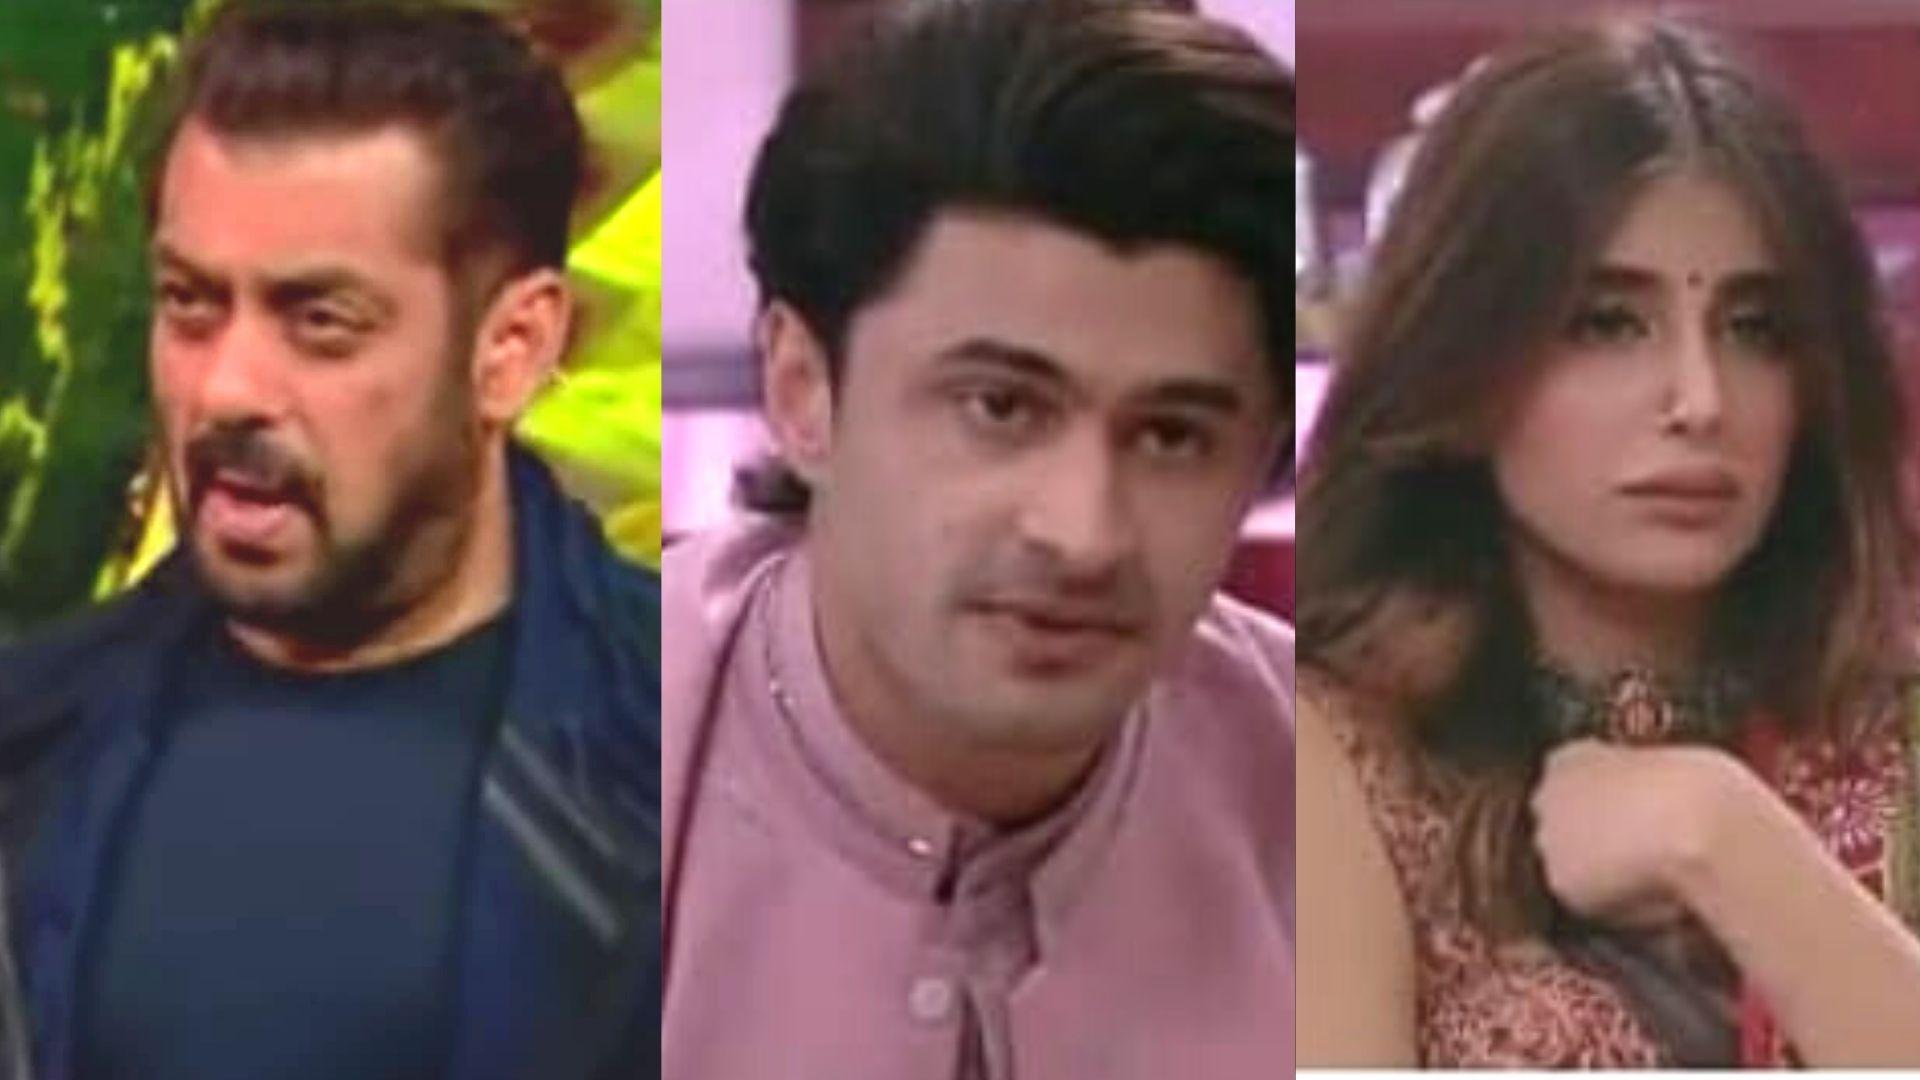 Bigg Boss 15 Weekend Ka Vaar: Host Salman Khan Slams Miesha Iyer And Ieshaan Sehgaal For Their Steamy Romance And PDA On National Television